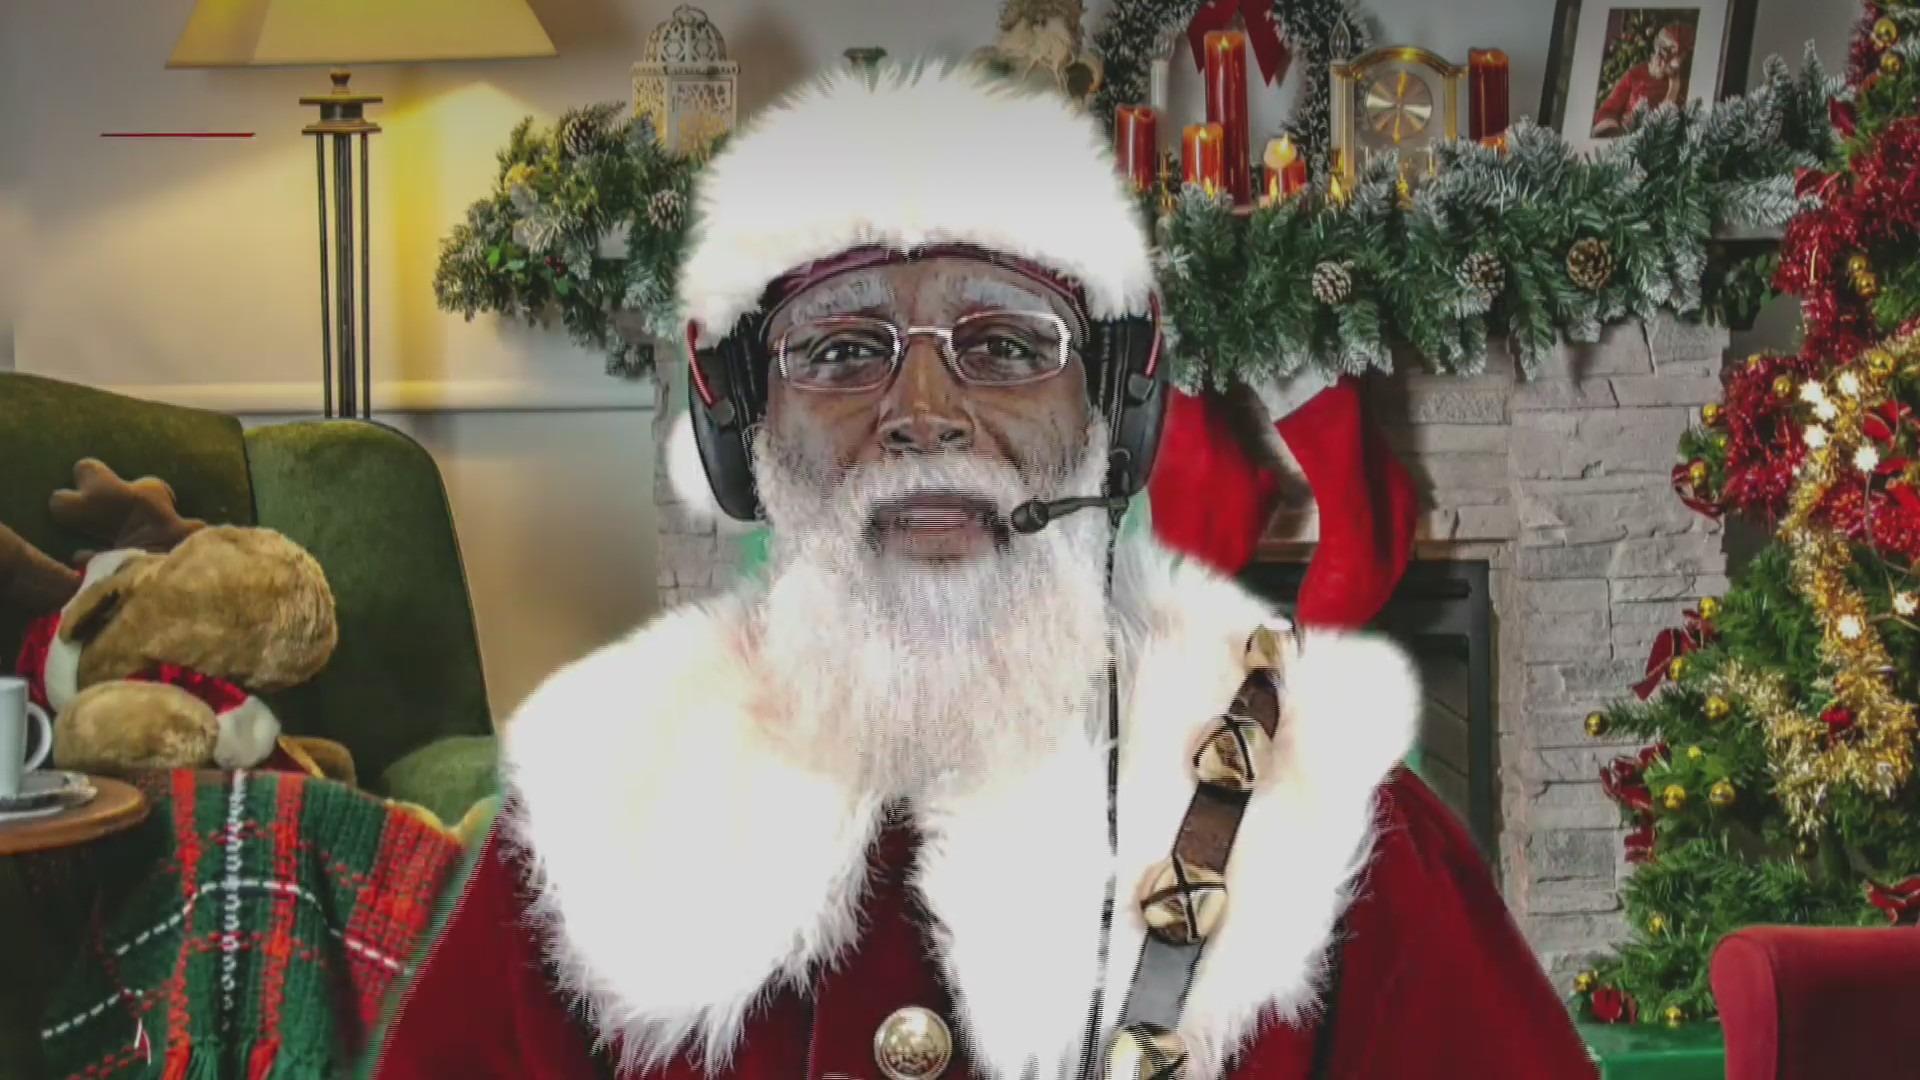 Christmas Day Restaurants 2020 St Louis Mo Cocoa Santa is bringing Christmas cheer and representation to the